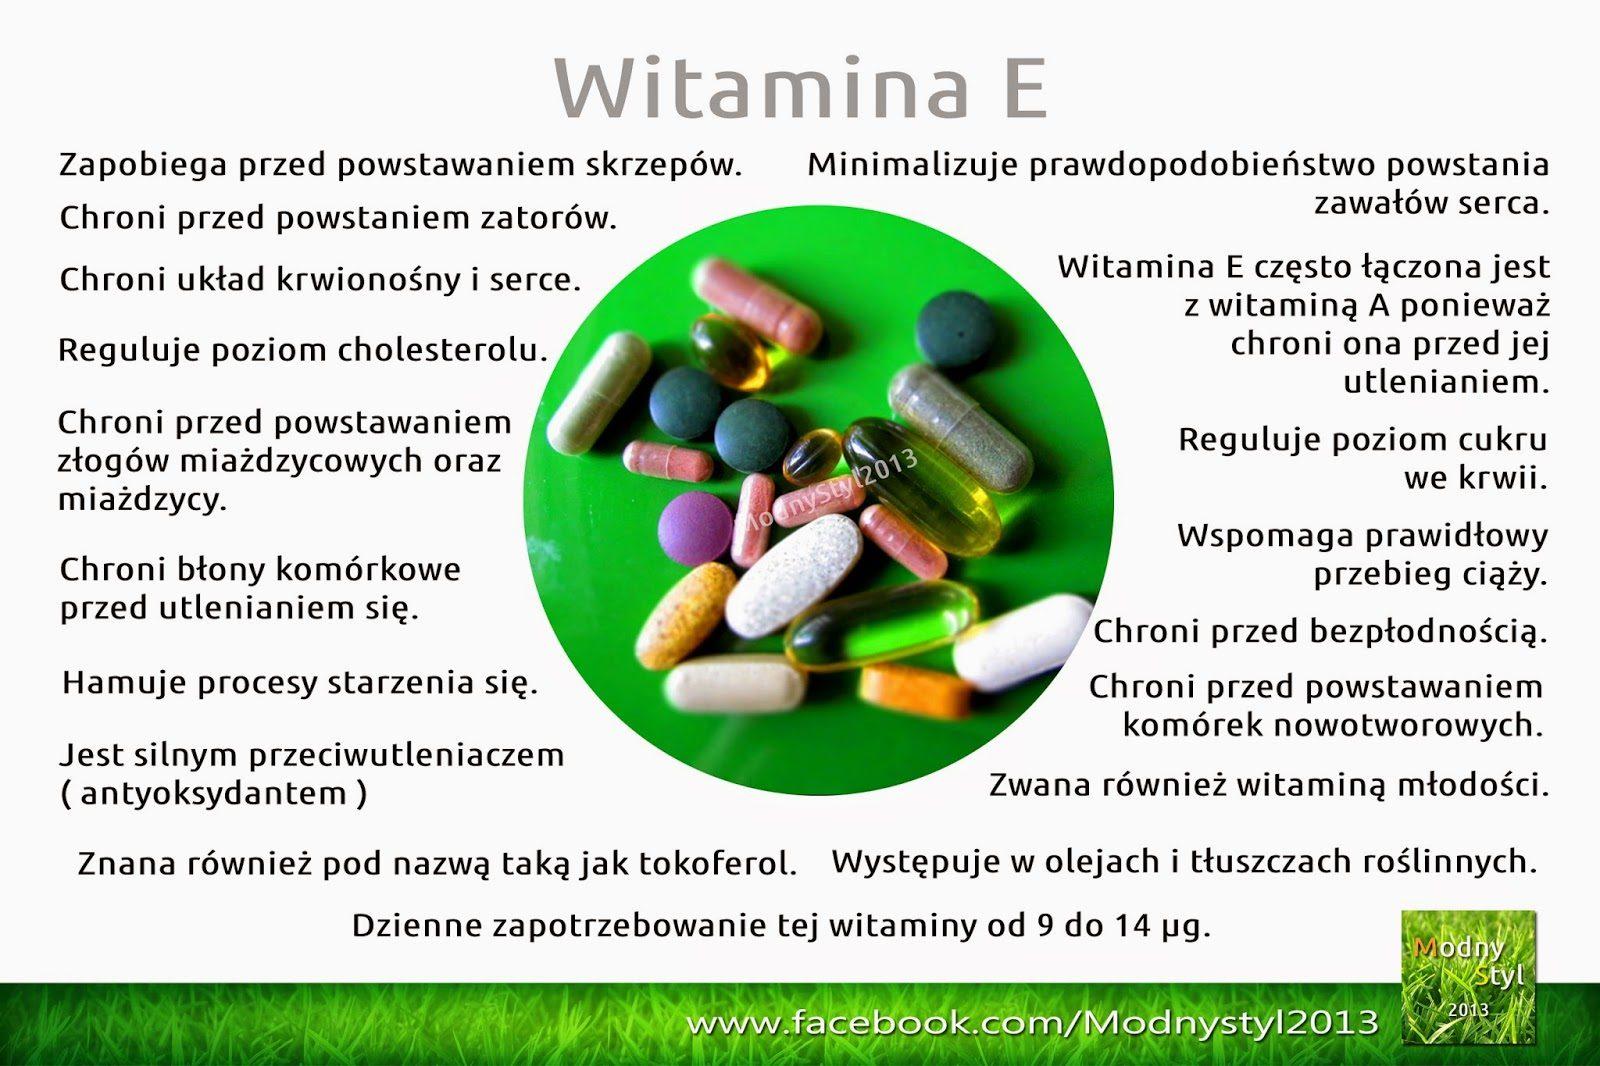 witamina2be-3859020